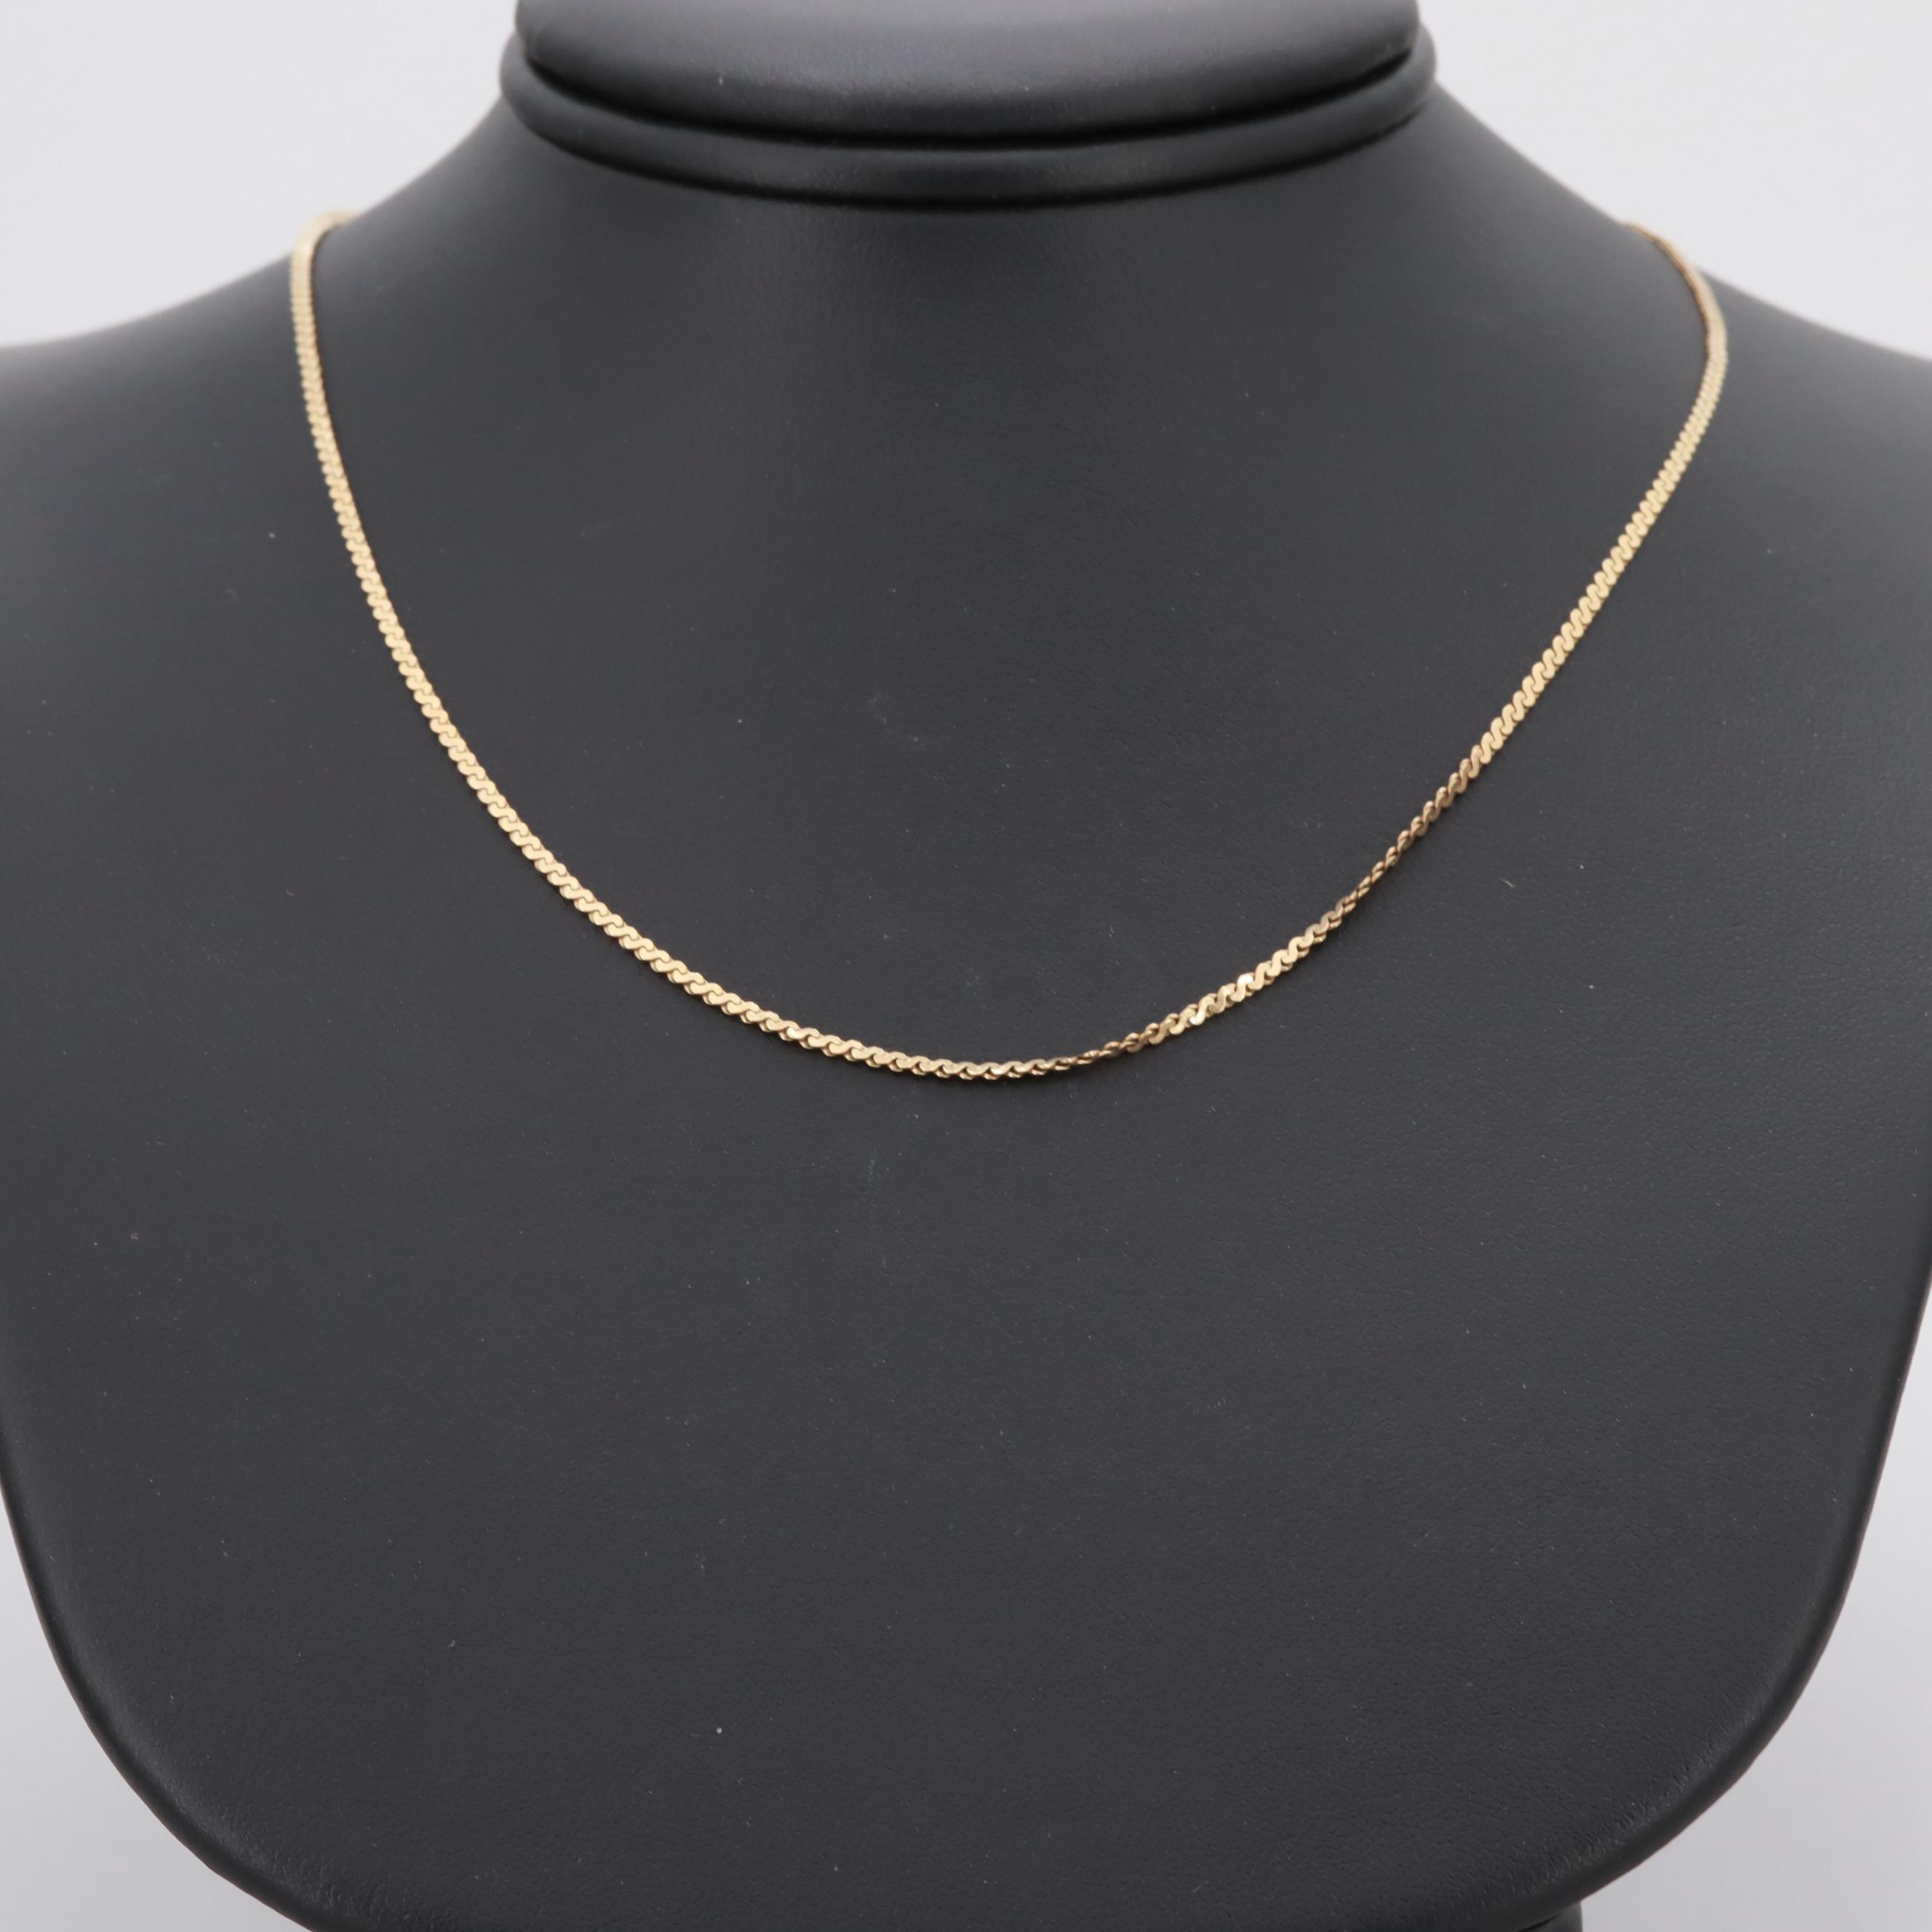 14K Yellow Gold Serpentine Chain Necklace